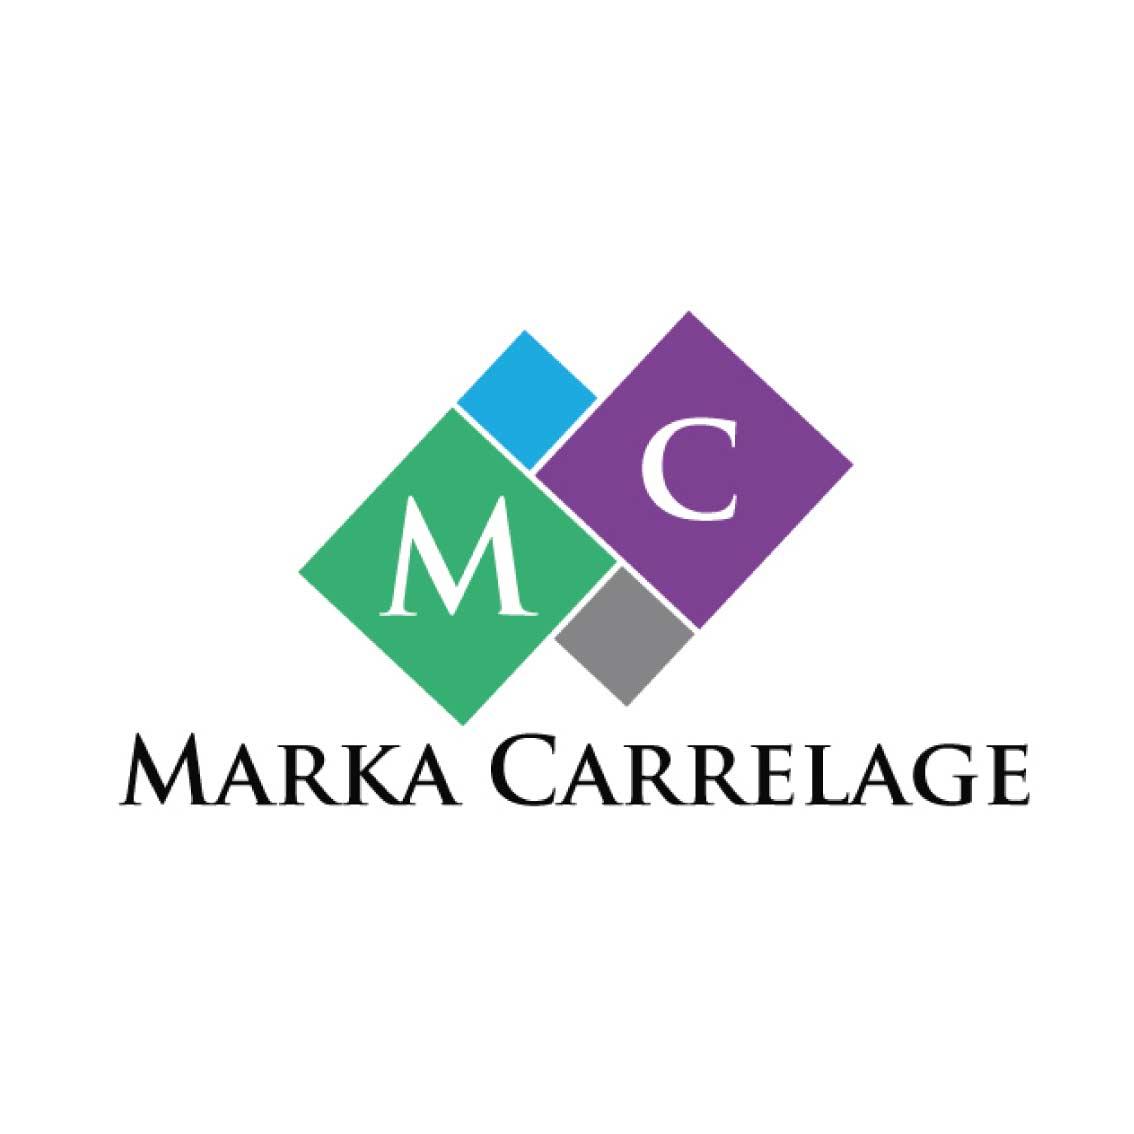 MARKA CARRELAGE